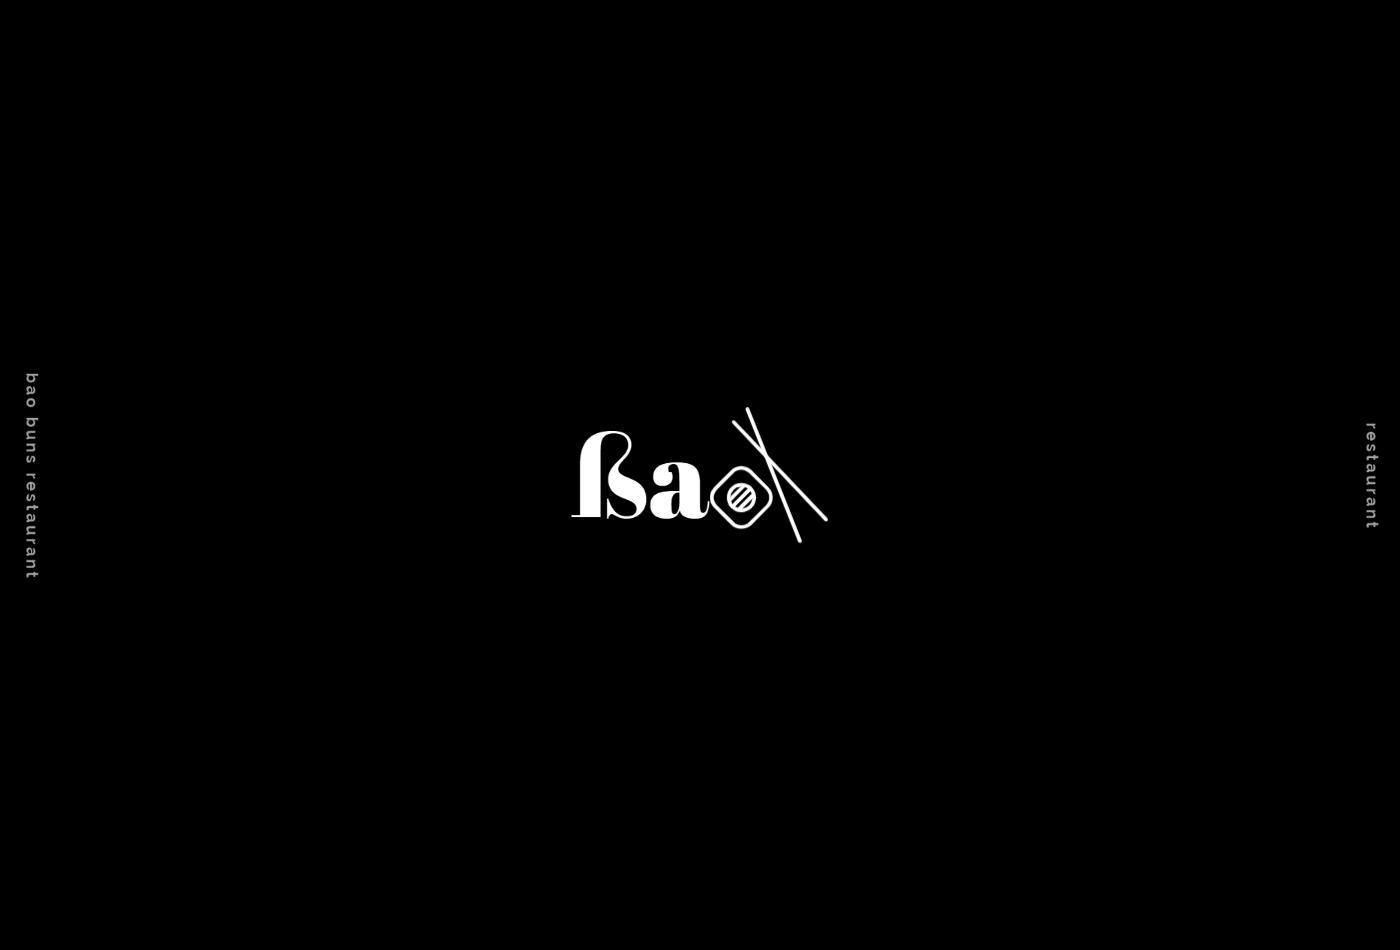 black and white,branding ,graphic design ,identity,logofolio,type,Minimalism,simplicity,typography  ,logo